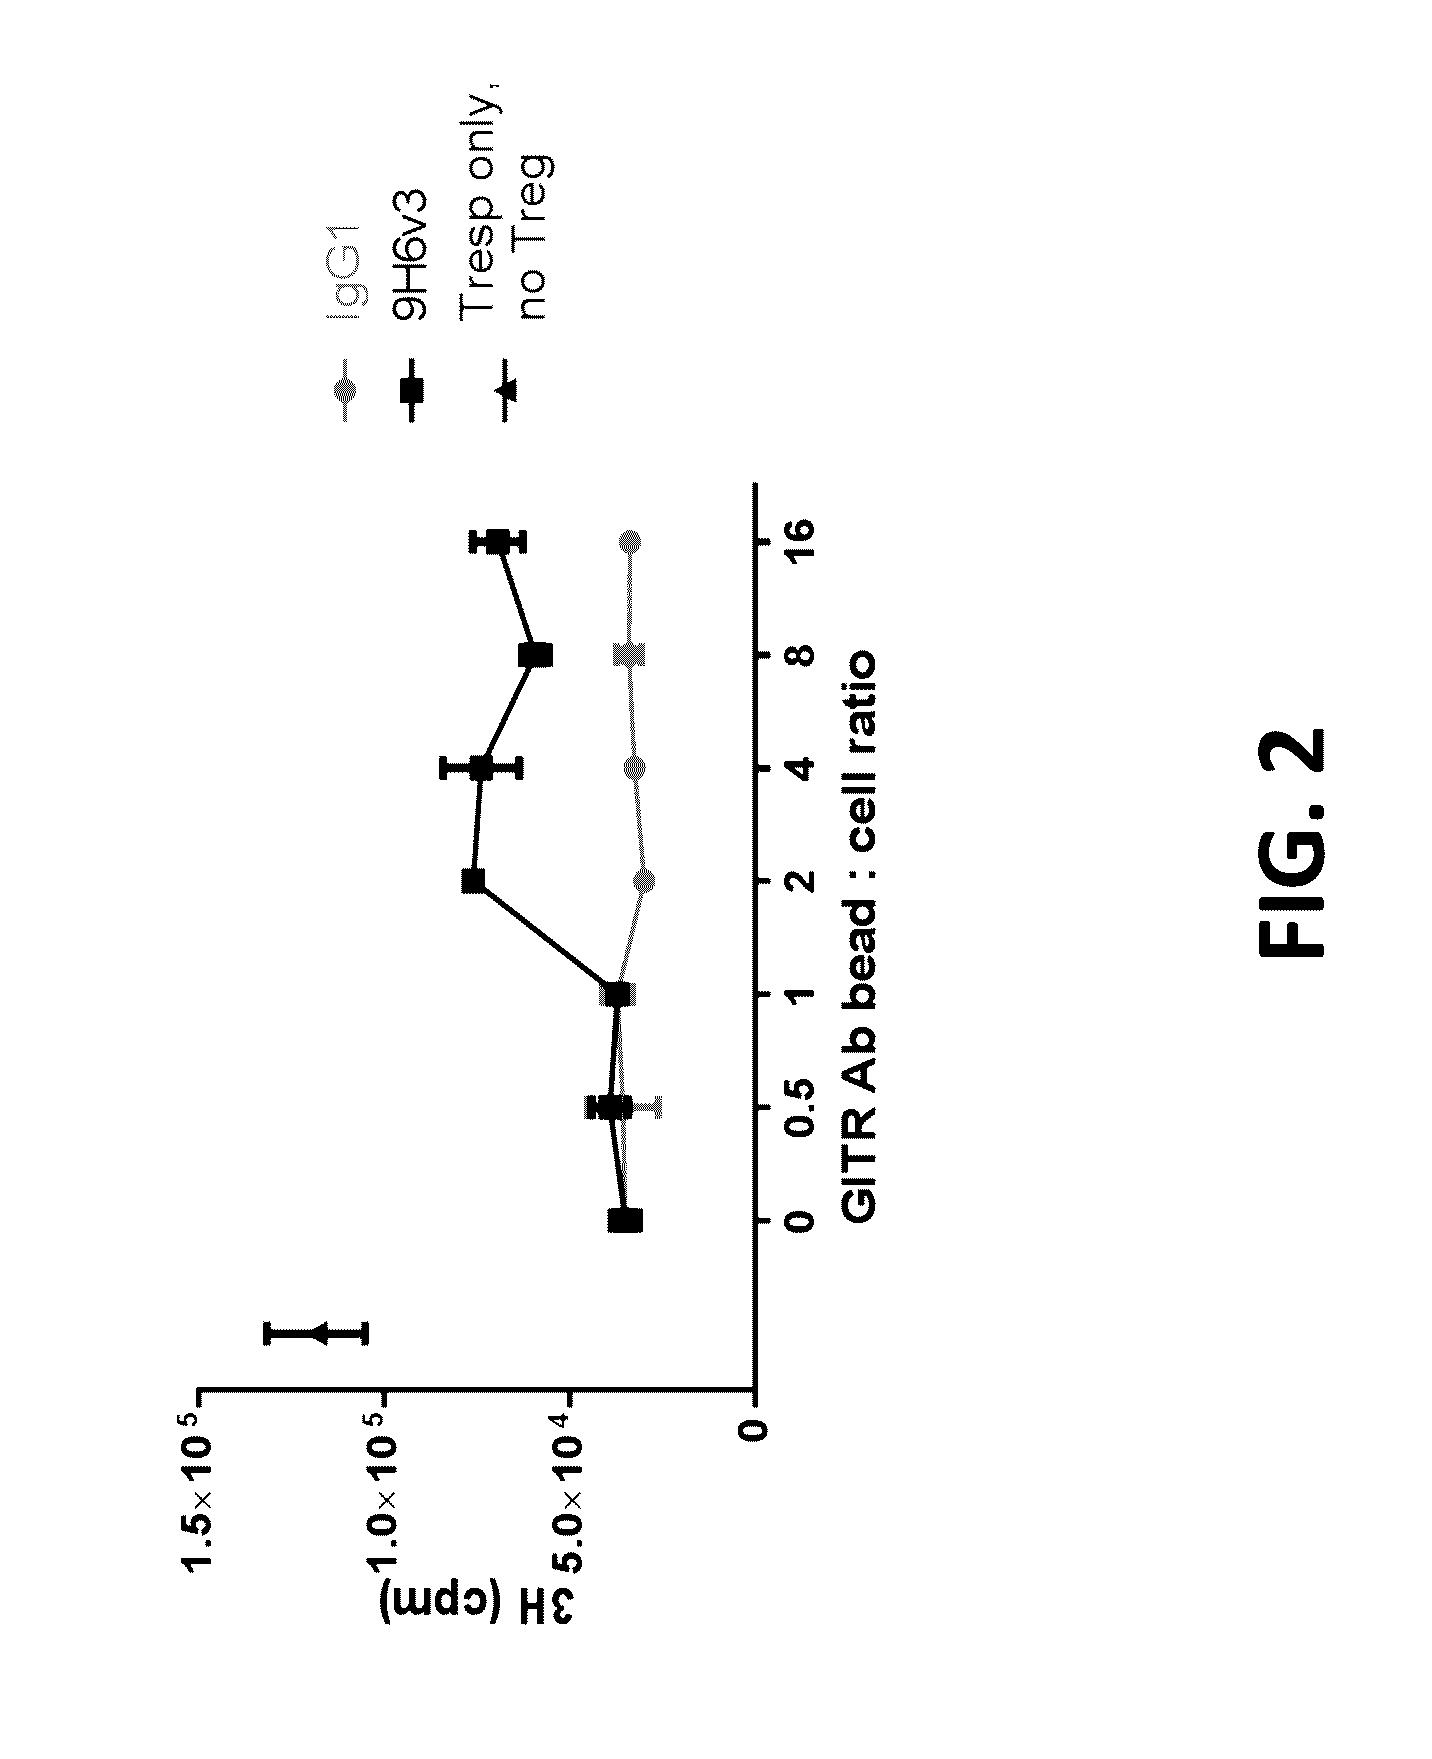 Patent Us 9464139 B2 Atlas Q Amp As 108 Wiring Diagram Images